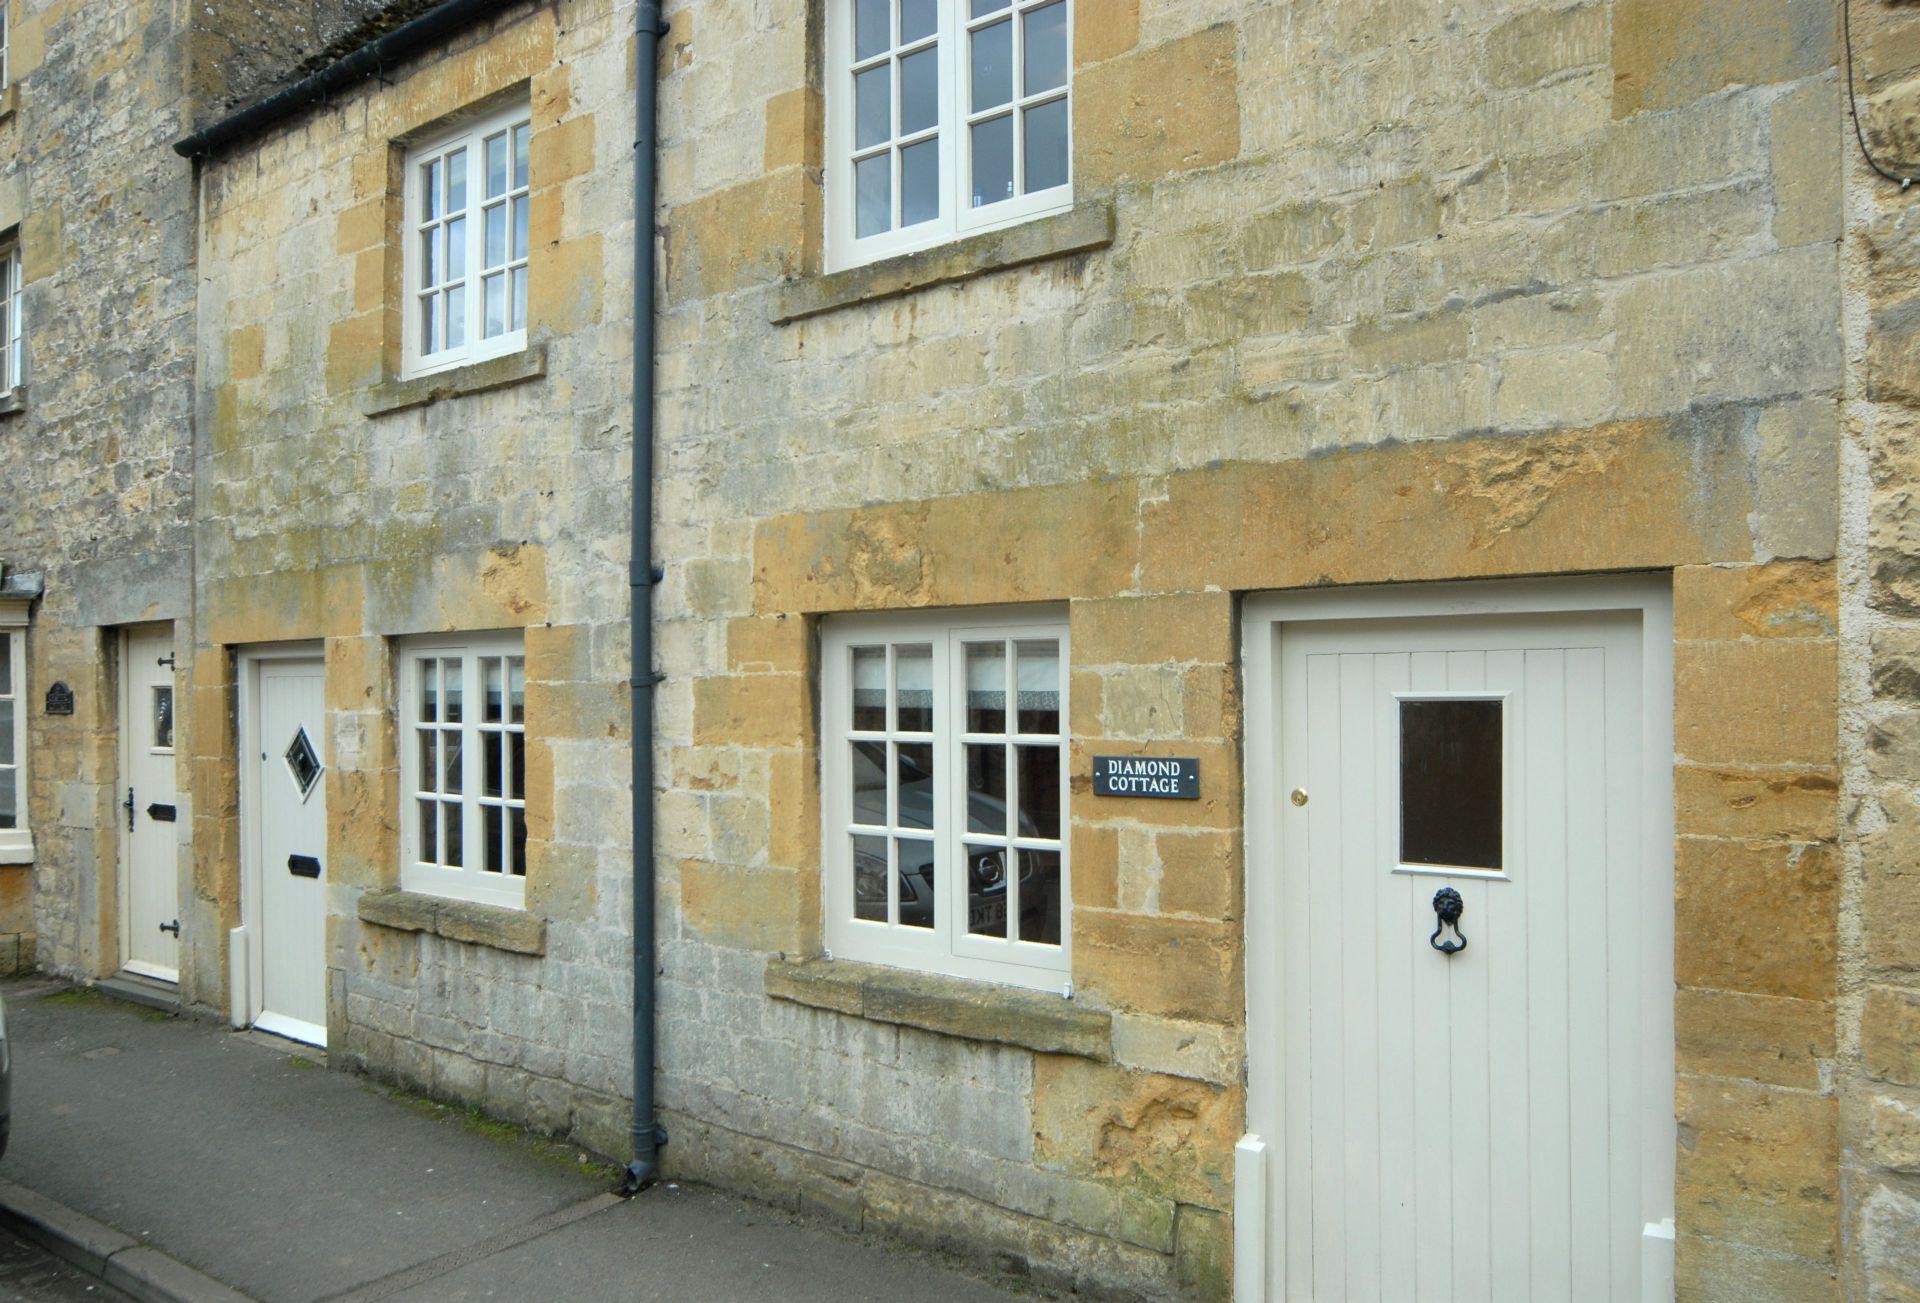 Diamond Cottage entrance